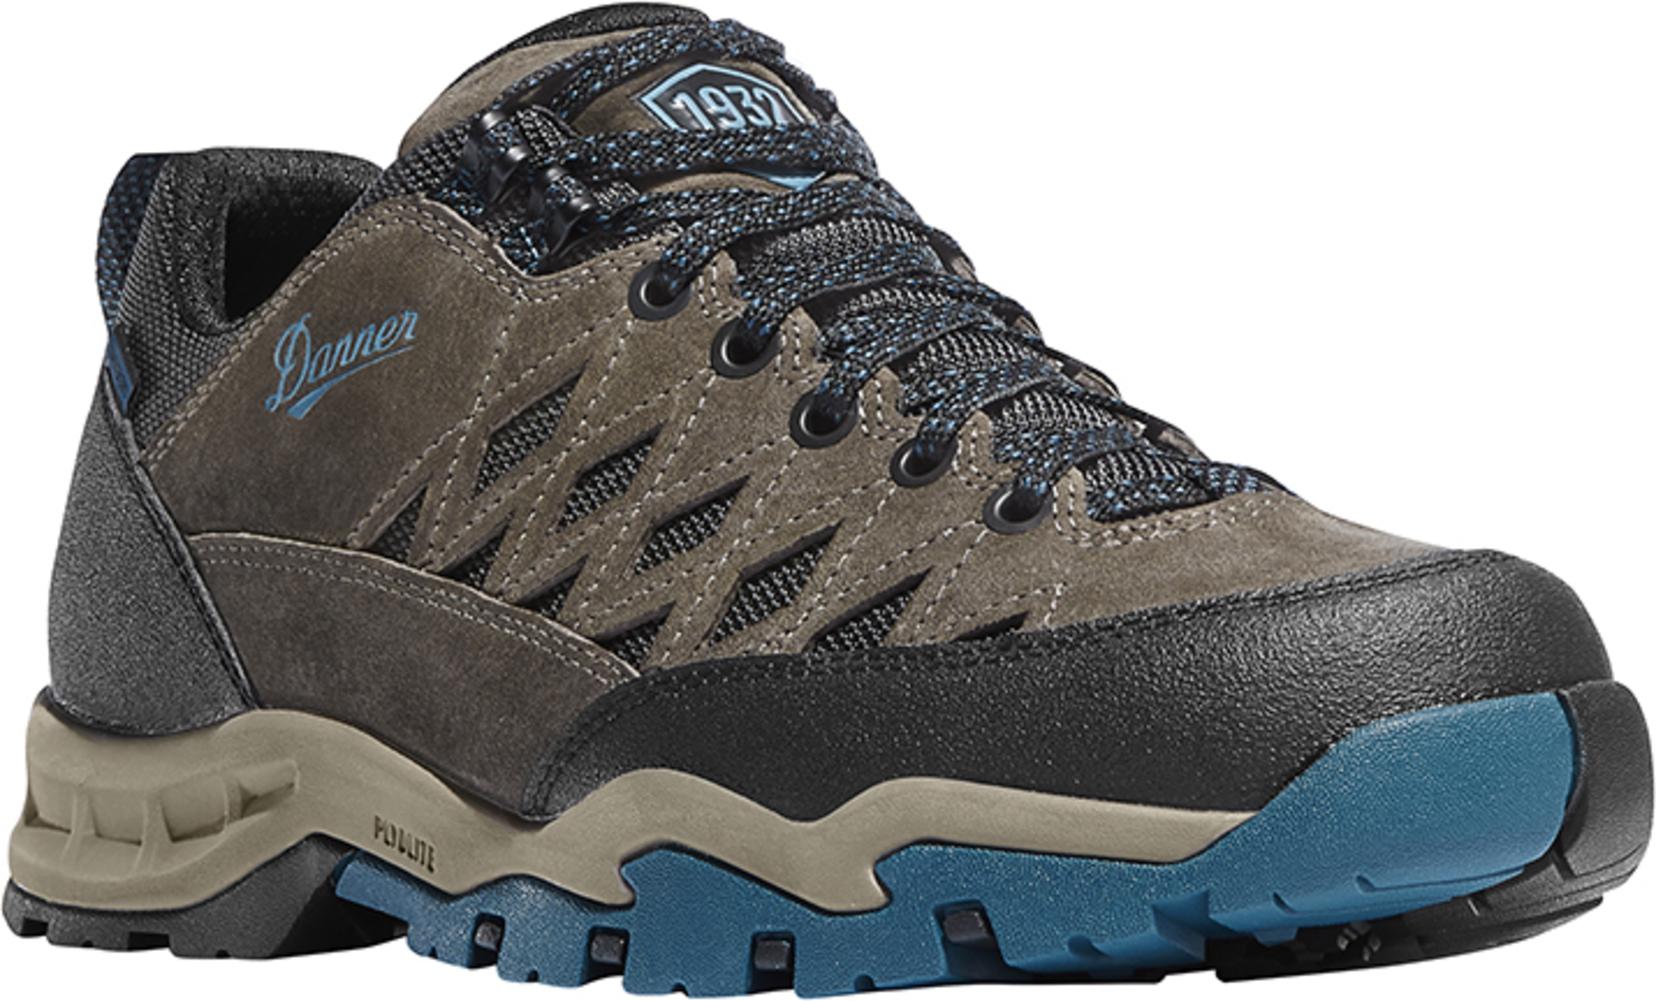 Danner Trailtrek Light Outdoor Gray/Blue 61381